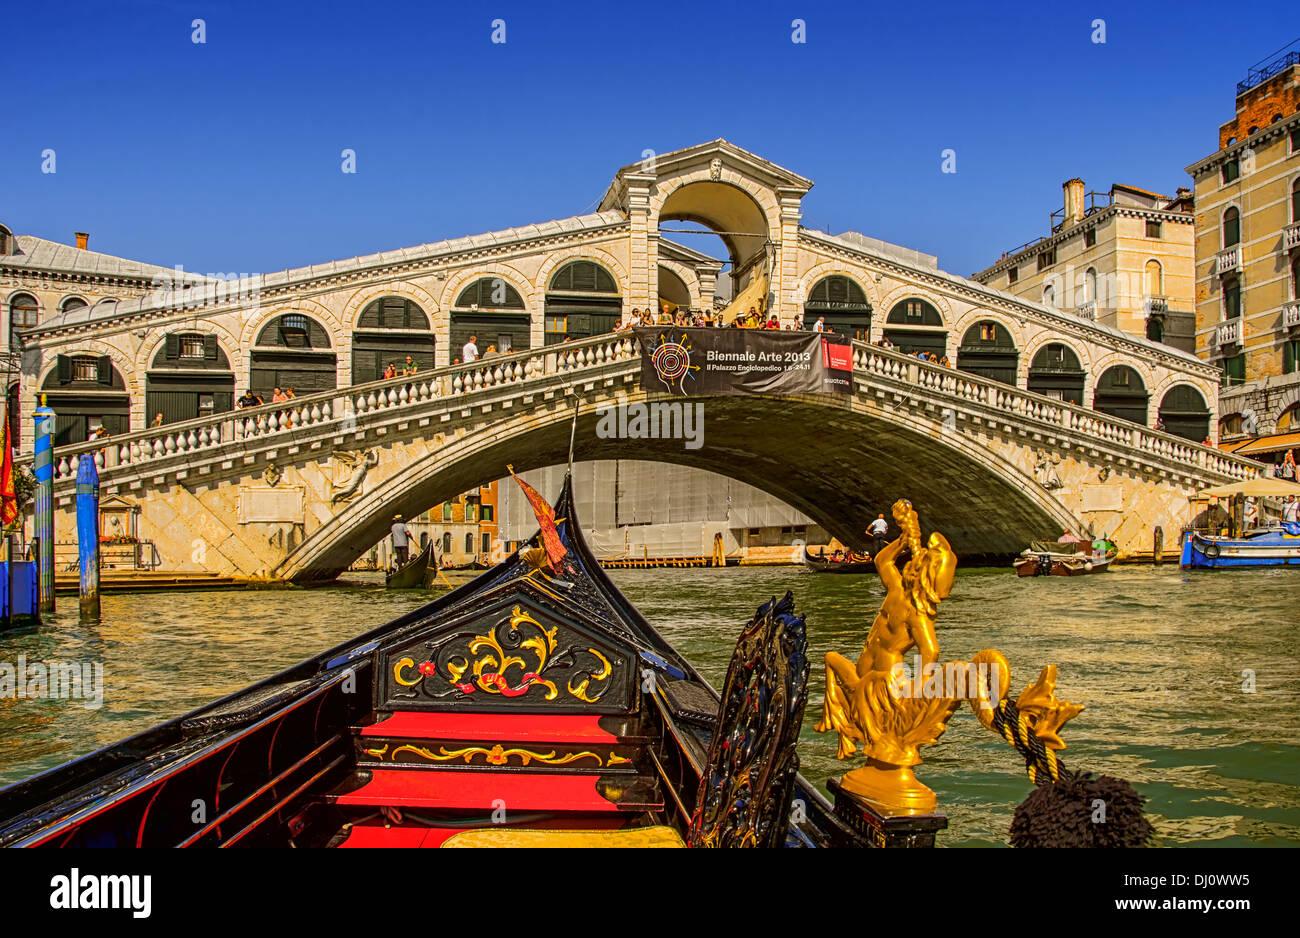 Gondola passengers view of the Rialto Bridge on the Grand Canal, Venice, Italy. Stock Photo